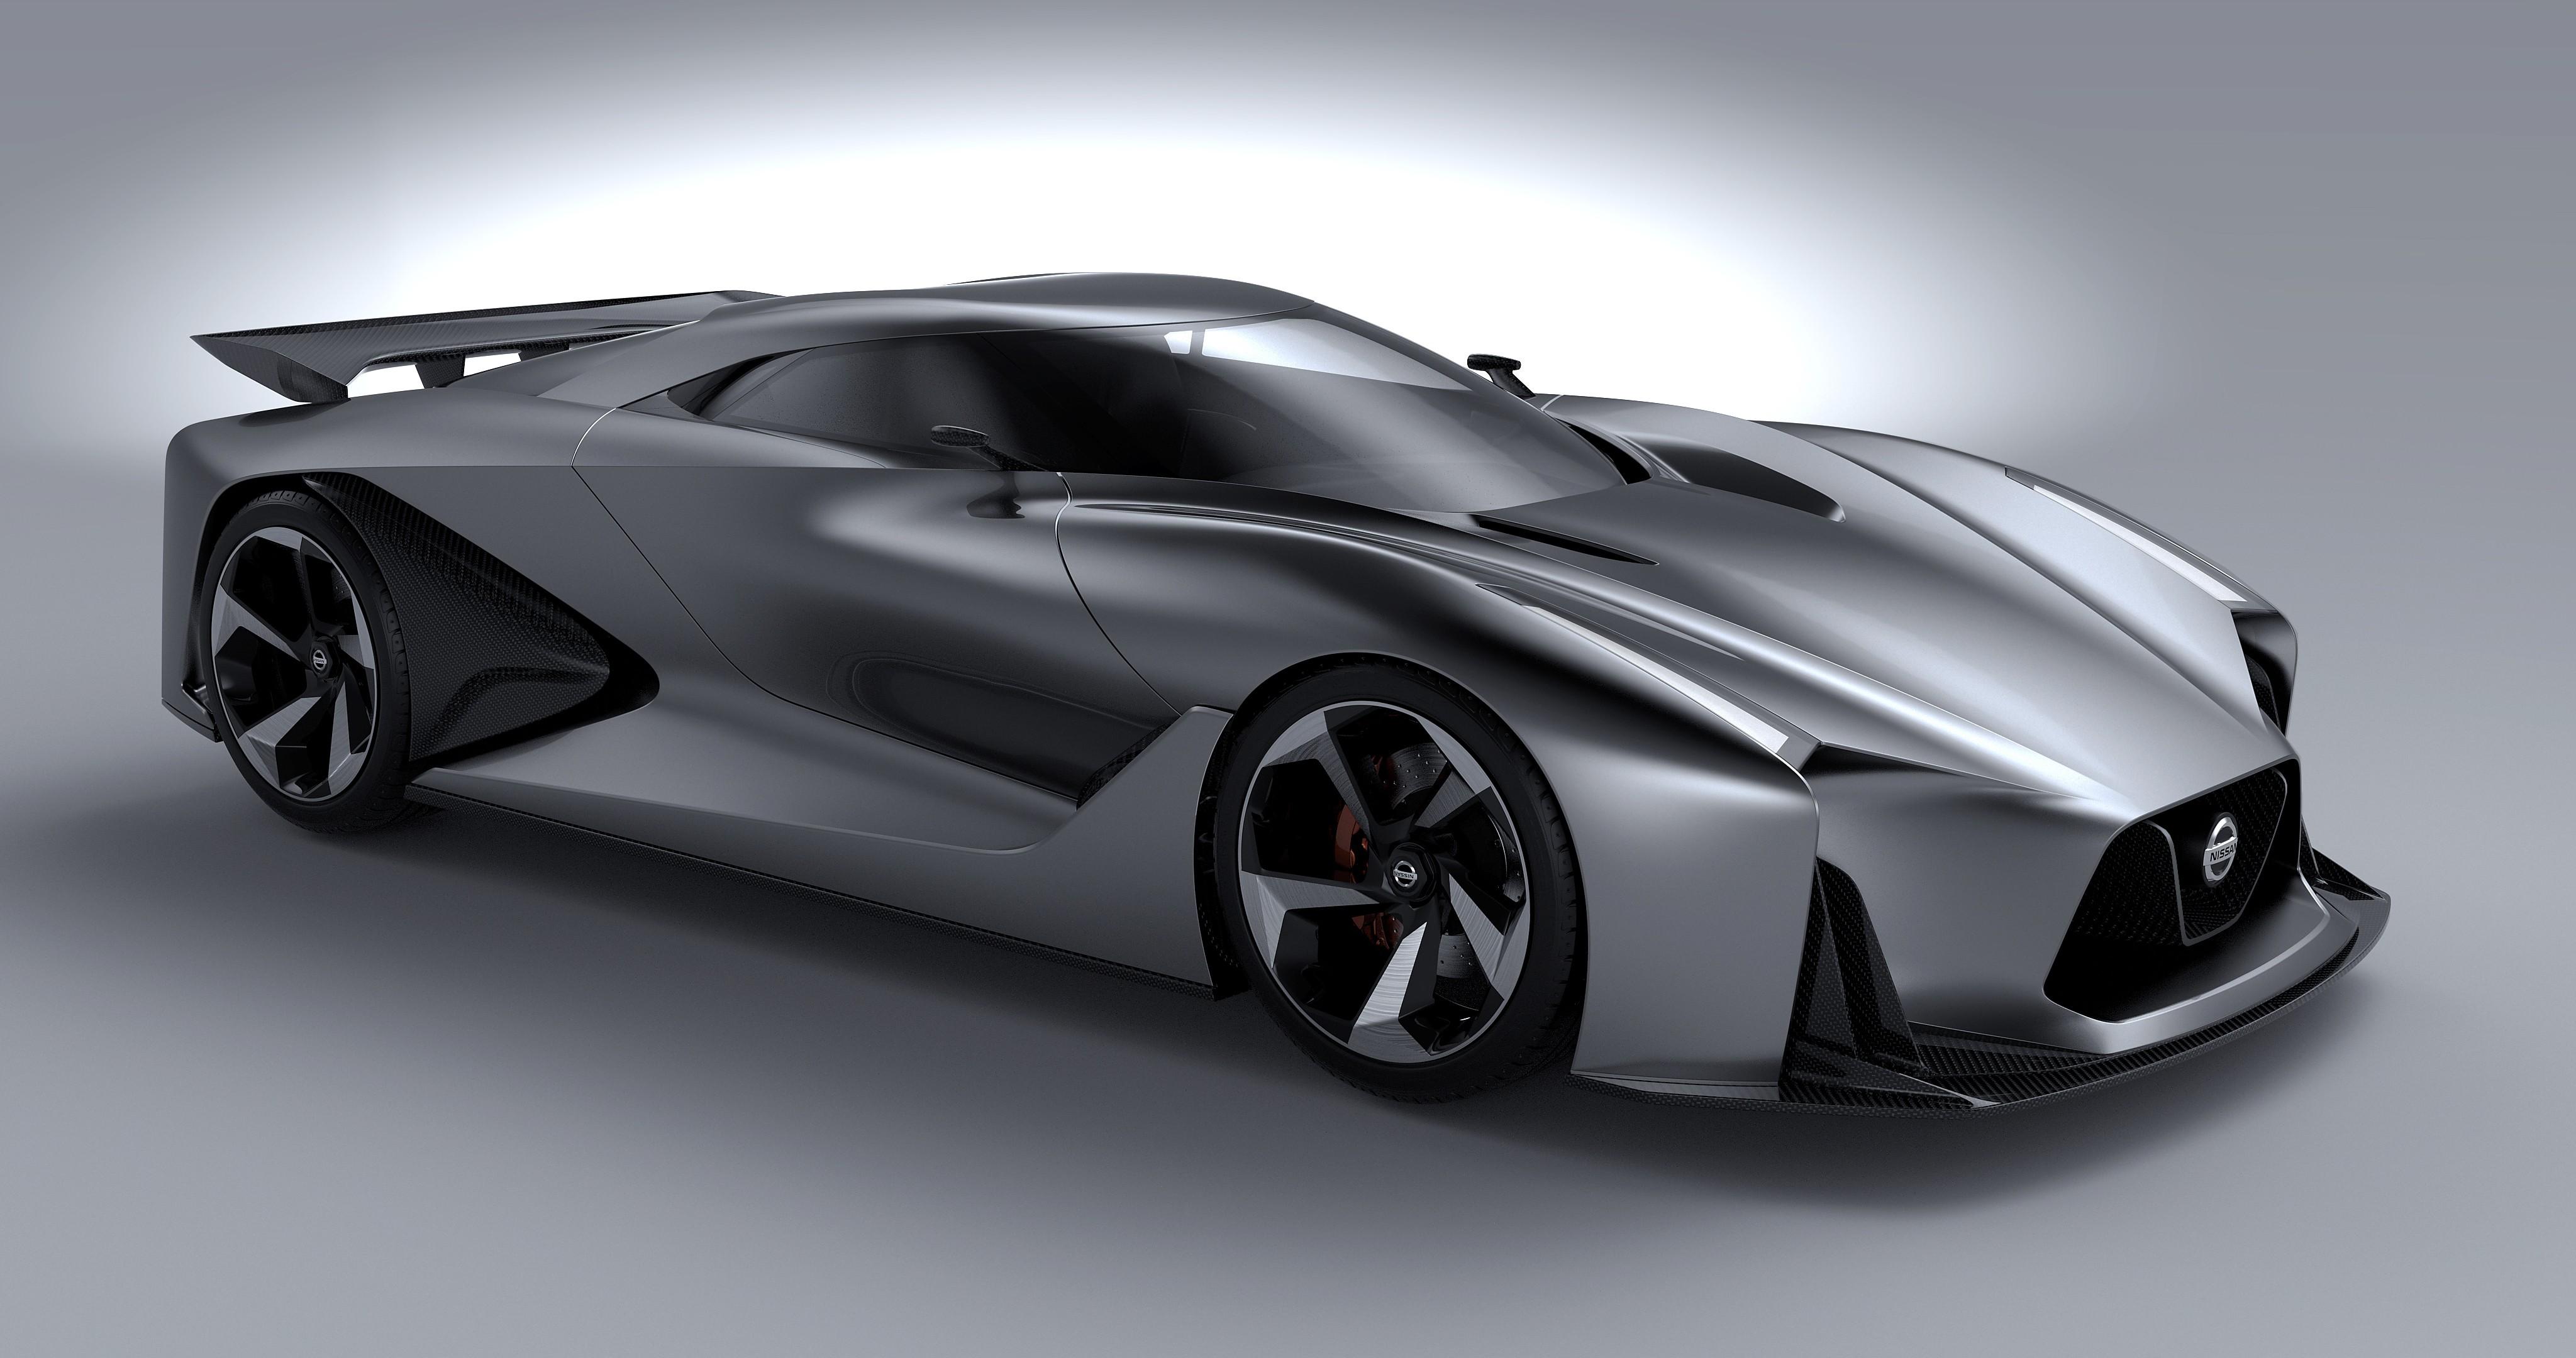 Wallpaper Nissan 2020 Vision Gran Turismo, concept, Nissan, supercar ...